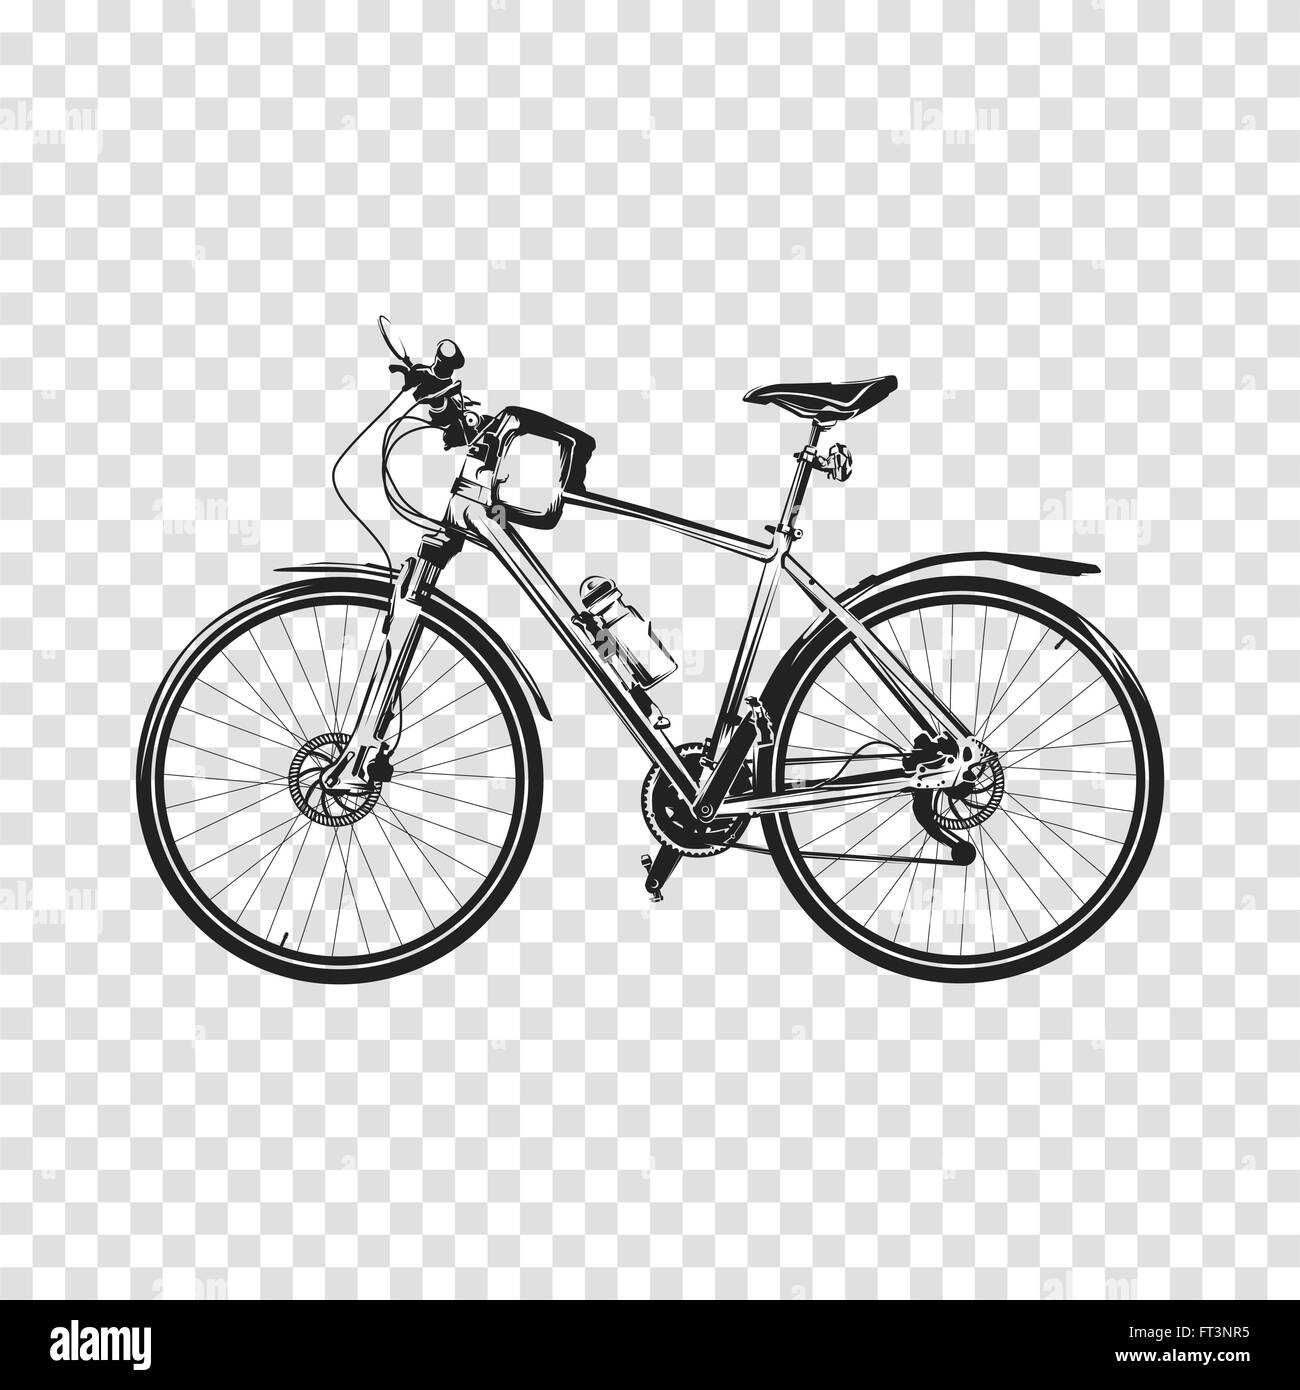 bike a transparent background bicycle silhouette illustration vector stock vector art. Black Bedroom Furniture Sets. Home Design Ideas